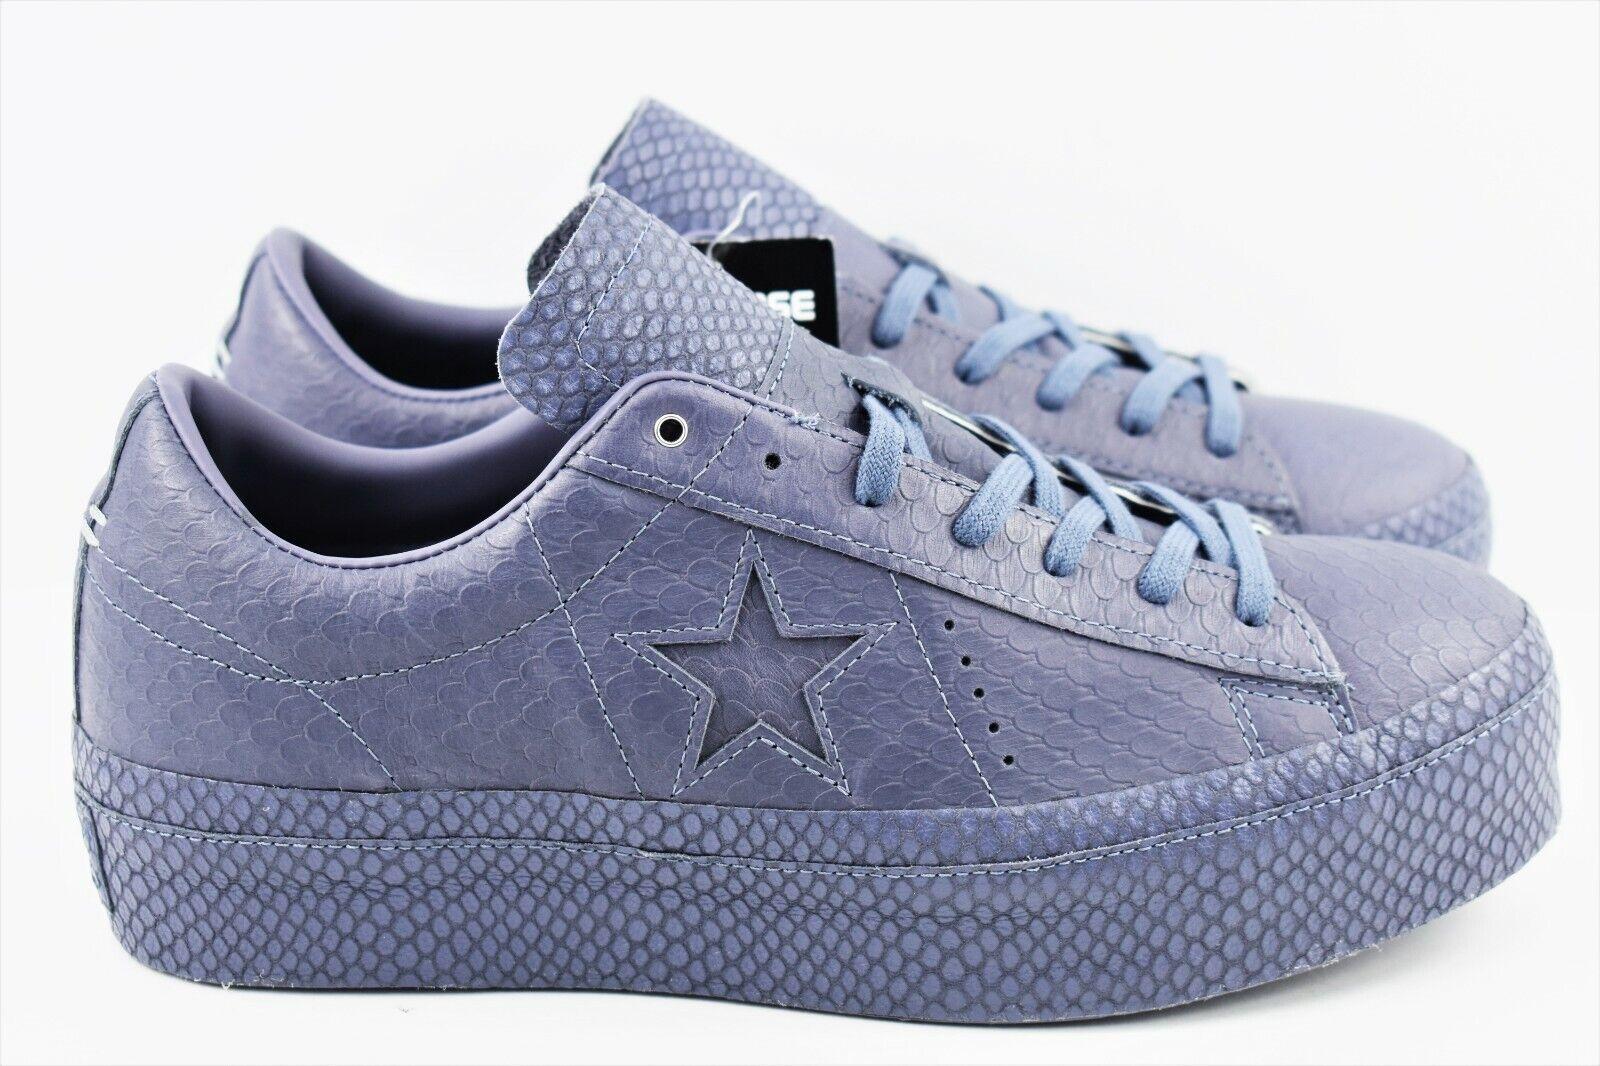 Converse One Star Platform Ox damen Größe 6.5 schuhe Light Carbon 559901C Leather